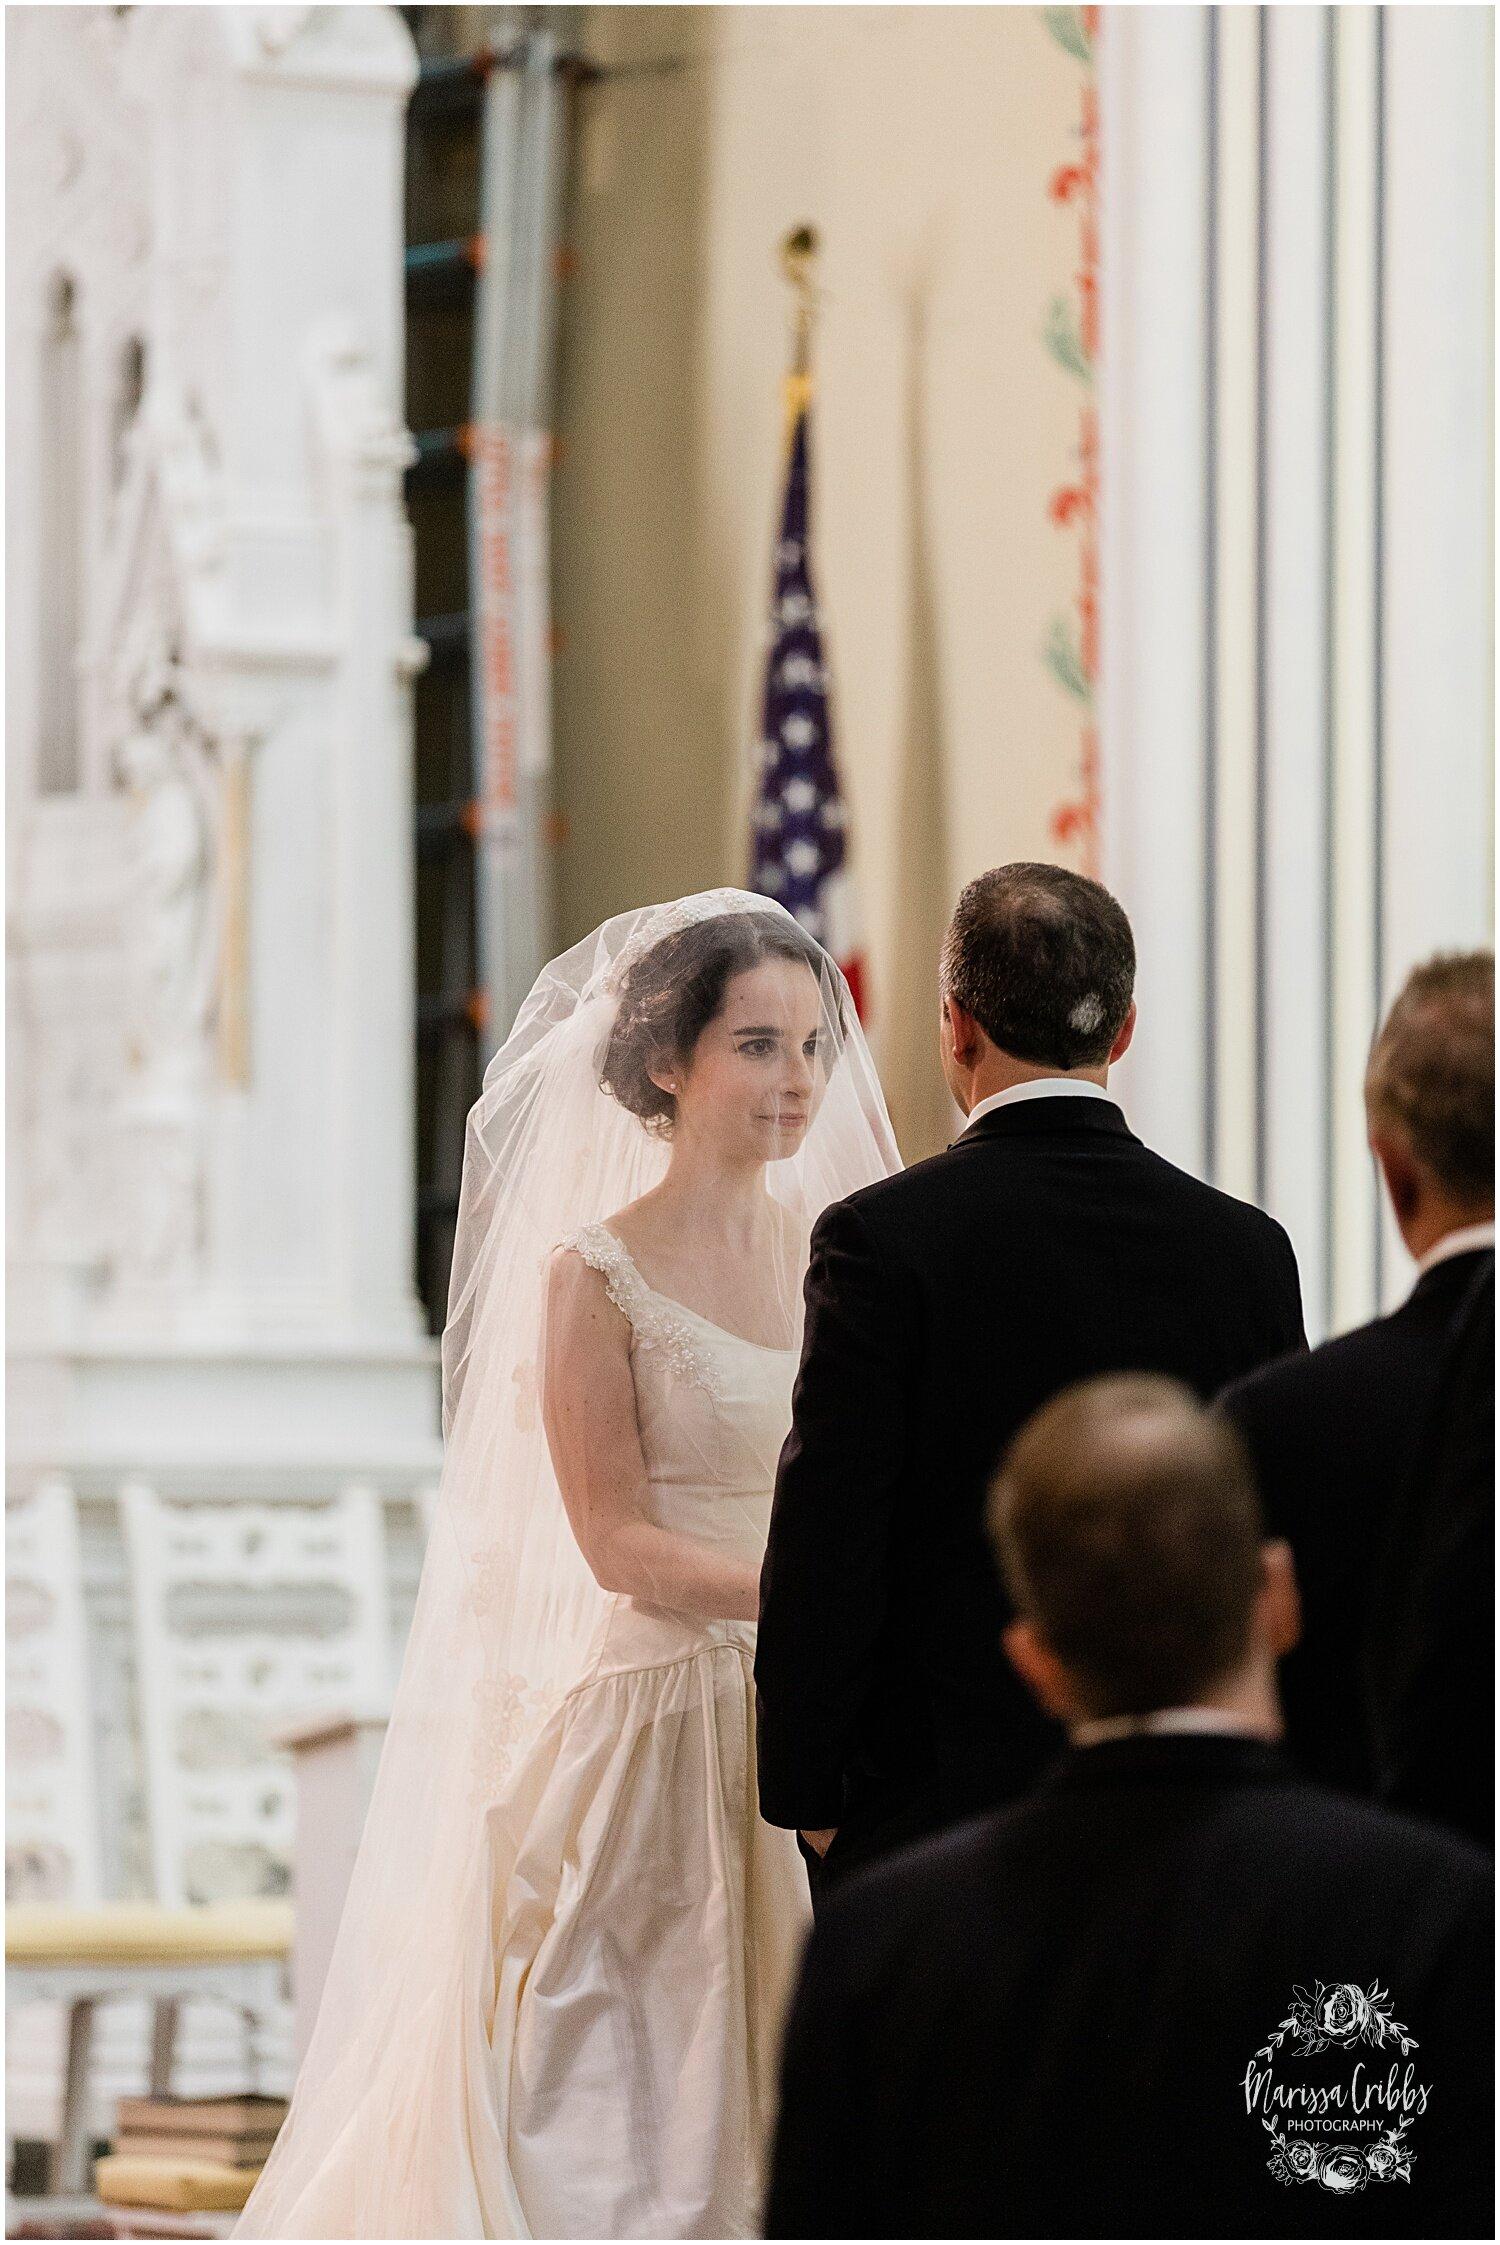 TYLER & CAROLINE MARRIED BLOG | MARISSA CRIBBS PHOTOGRAPHY | THE CARRIAGE CLUB | KANSAS CITY WEDDING PHOTOS_9225.jpg